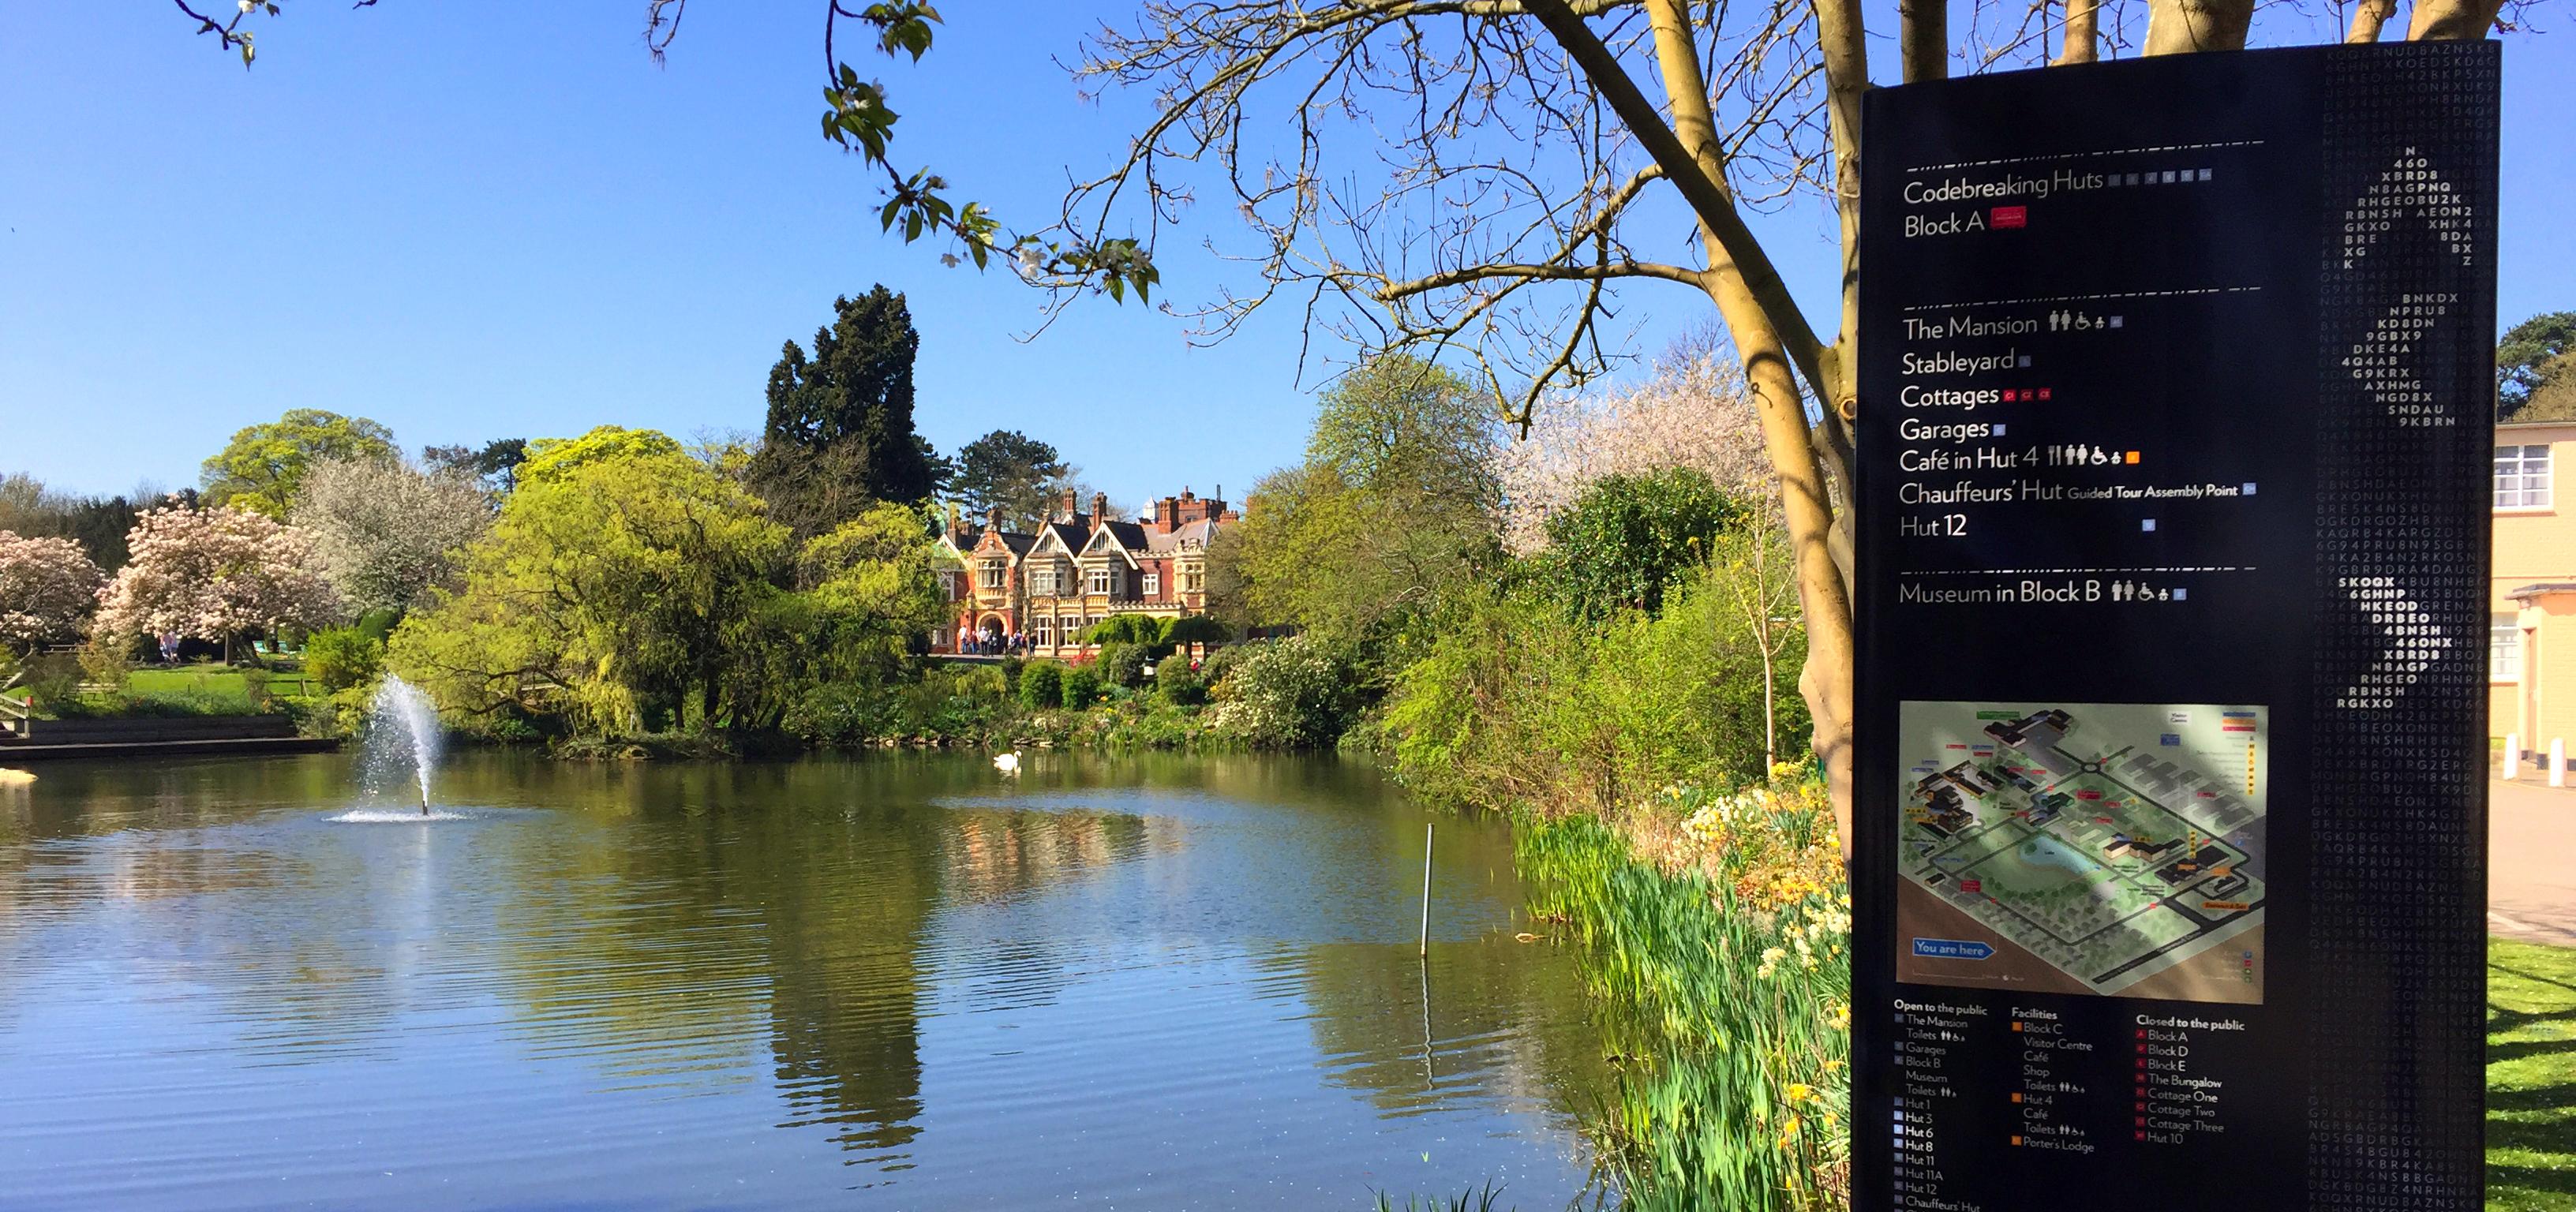 Bletchey Park, Inglaterra bletchley park - 24943051518 a64155527f o - Bletchley Park, el secreto mejor guardado de Inglaterra